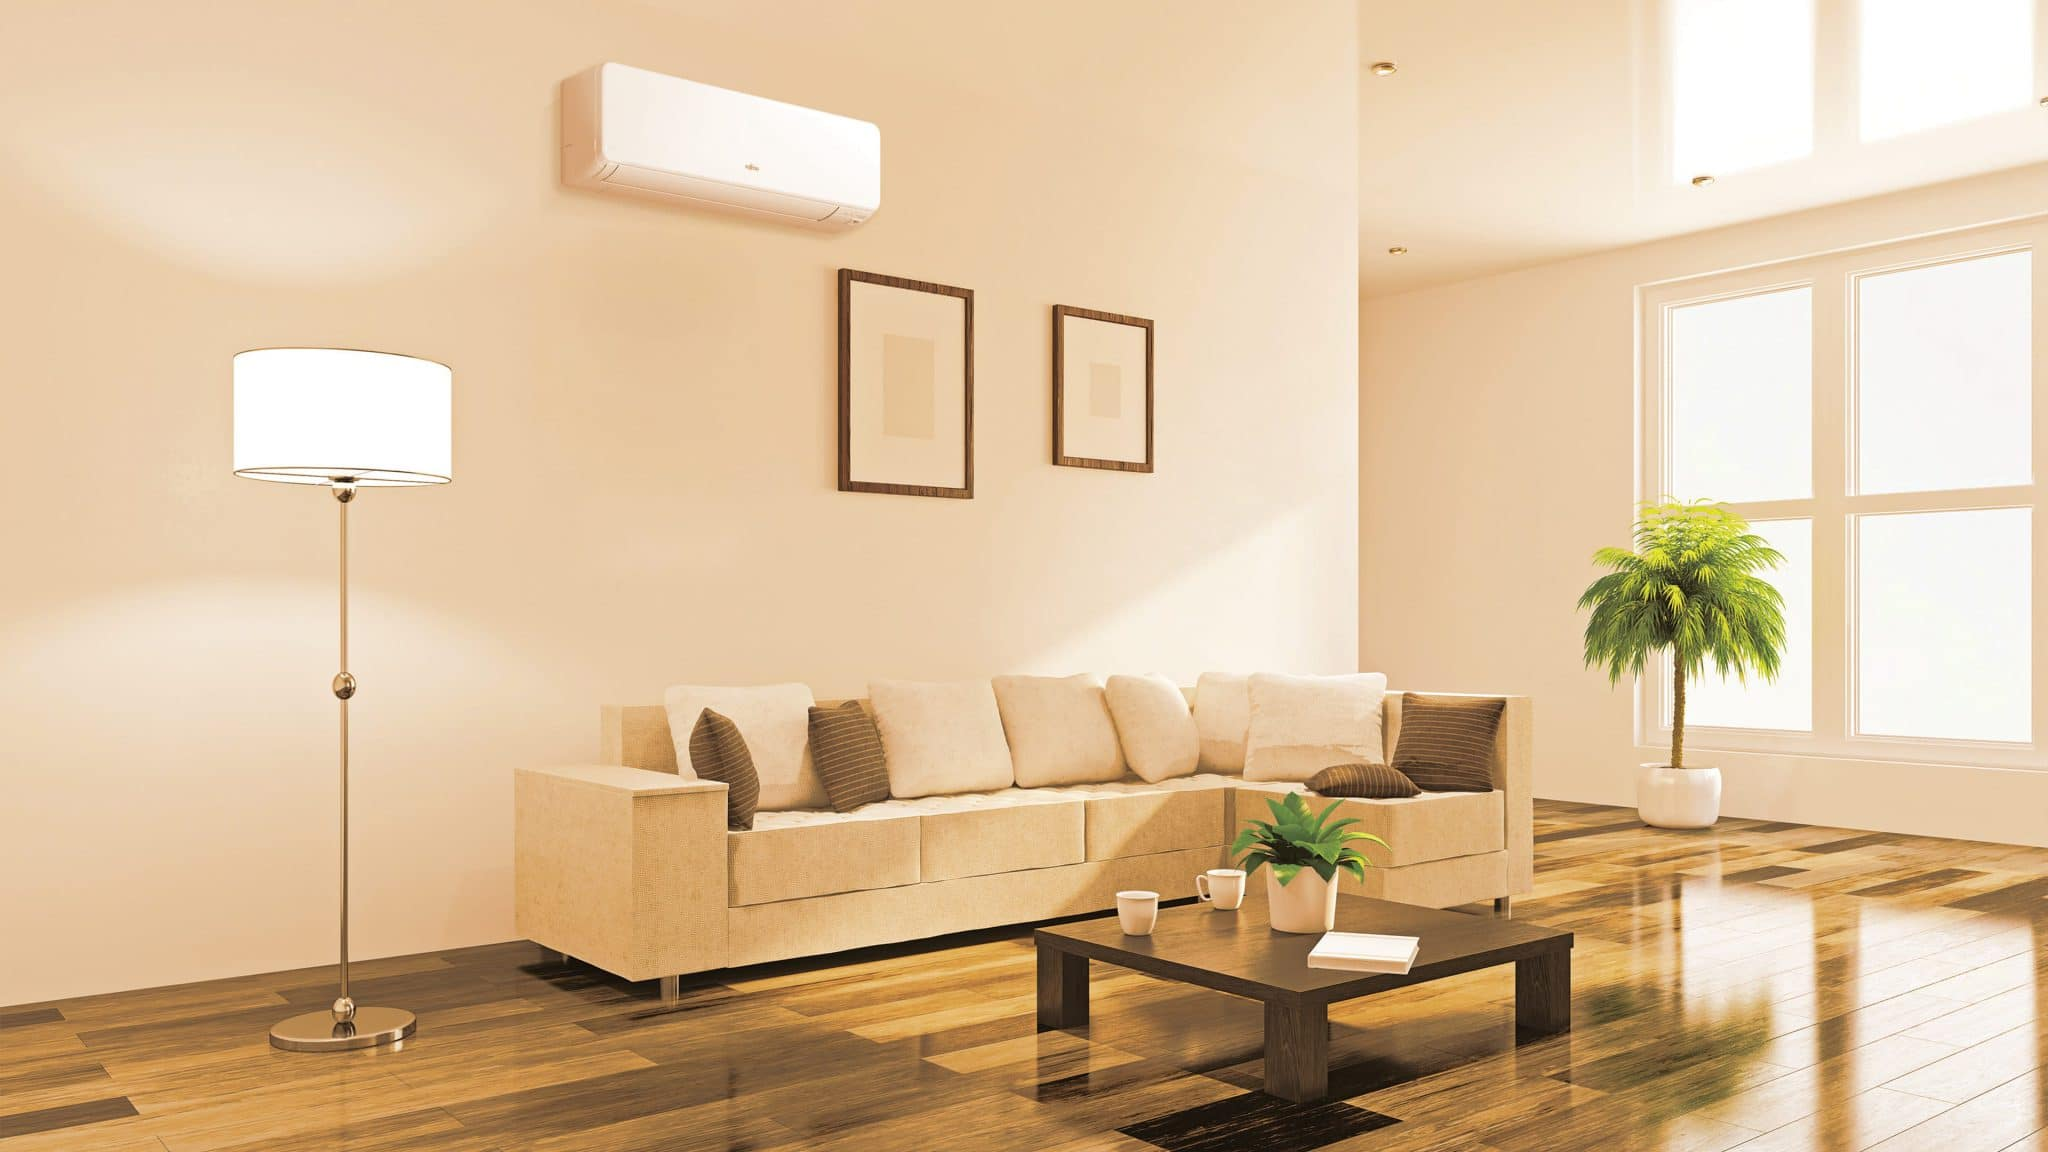 Green House Solutions zonnepanelen batterijopslag laadpalen airconditioning fujitsu 000003